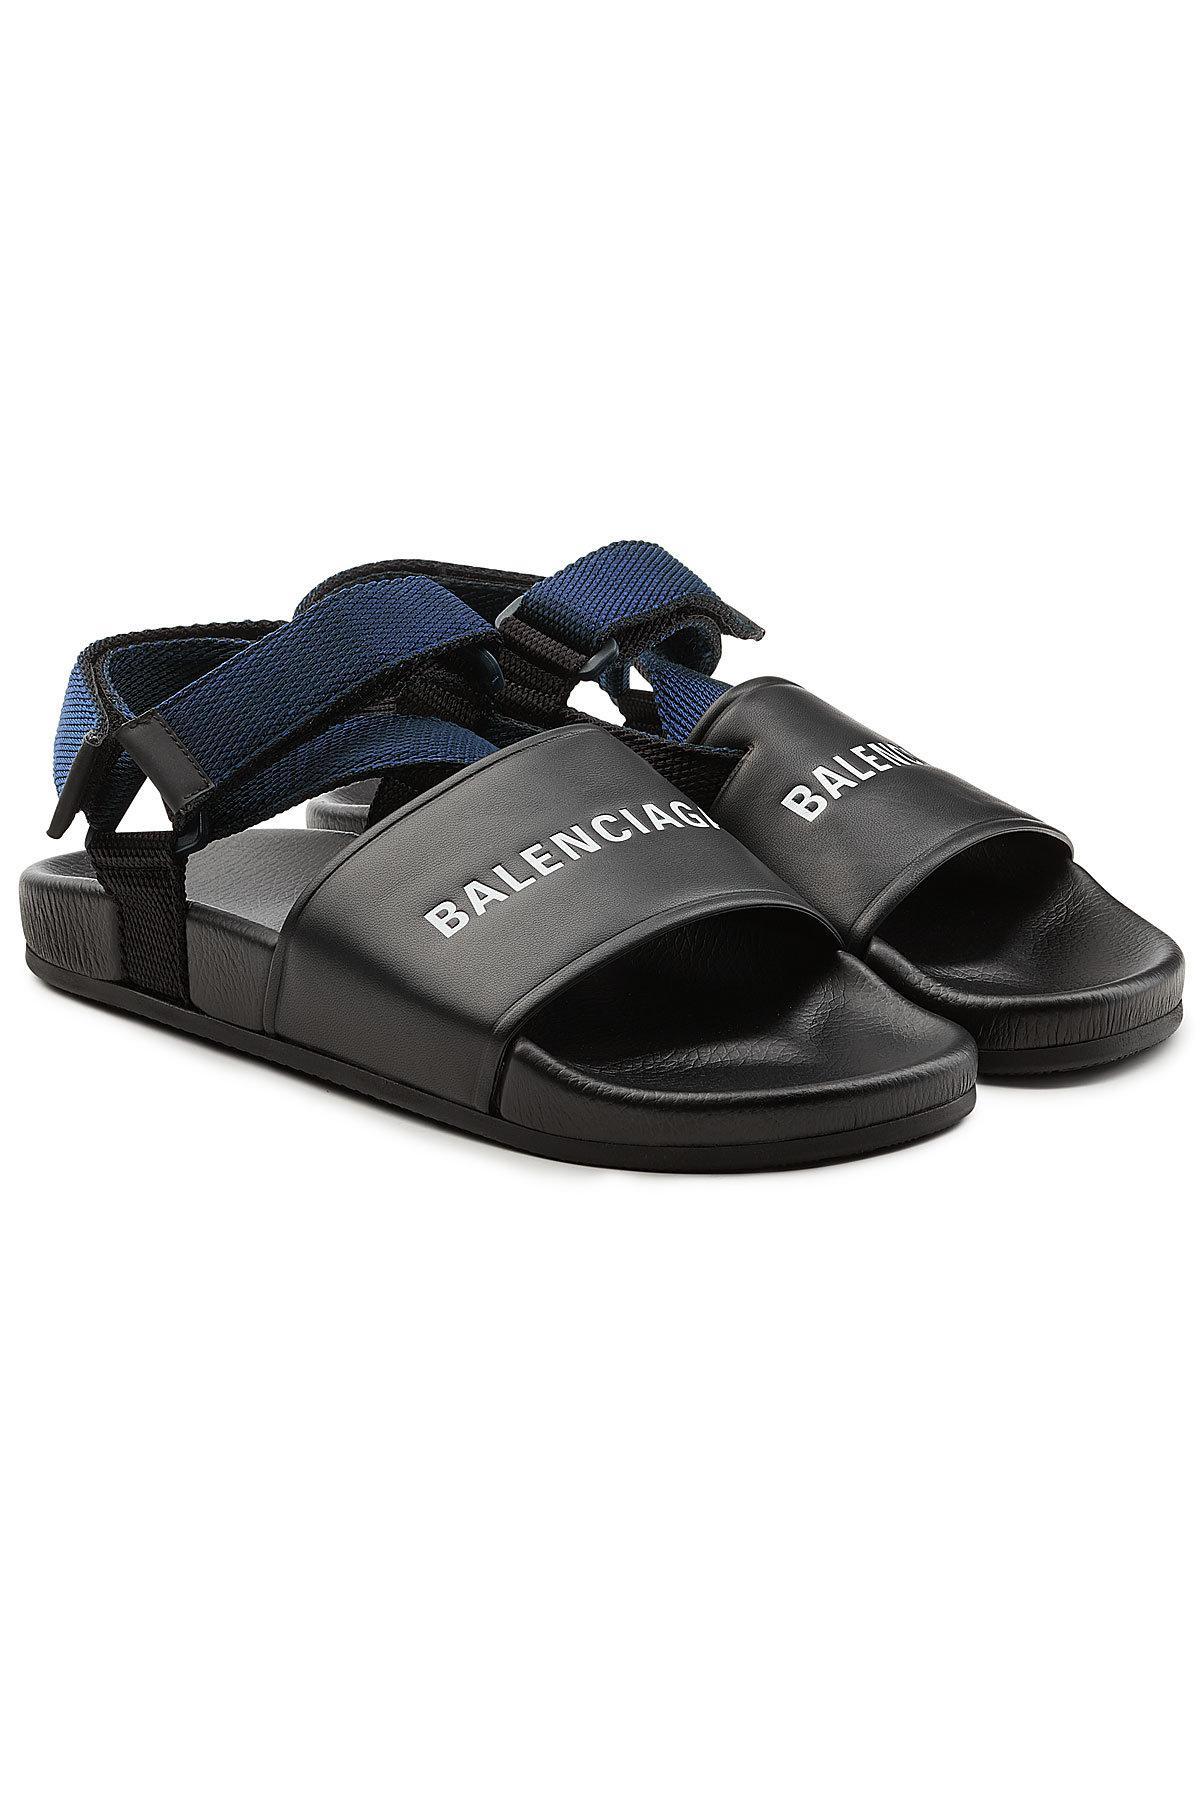 8e49a52cf65b Balenciaga Leather Sandals in Black for Men - Lyst